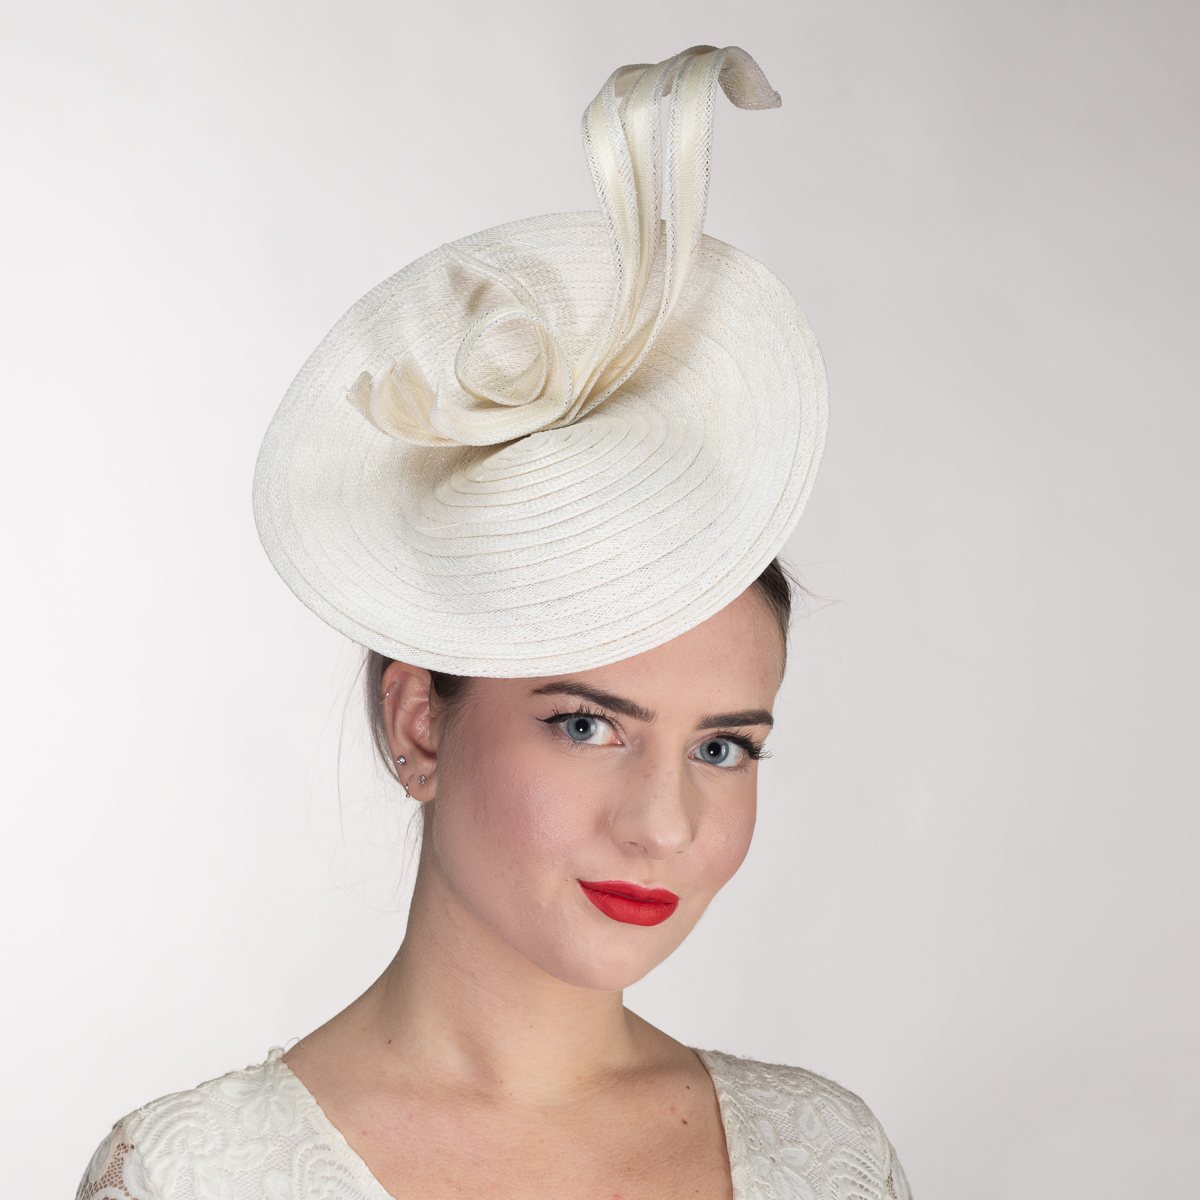 79dc536c7a251 White Twist Ribbon Sinamay Braid Disc Headband Fascinator Cocktail Hats-102055-WT-  Sun Yorkos